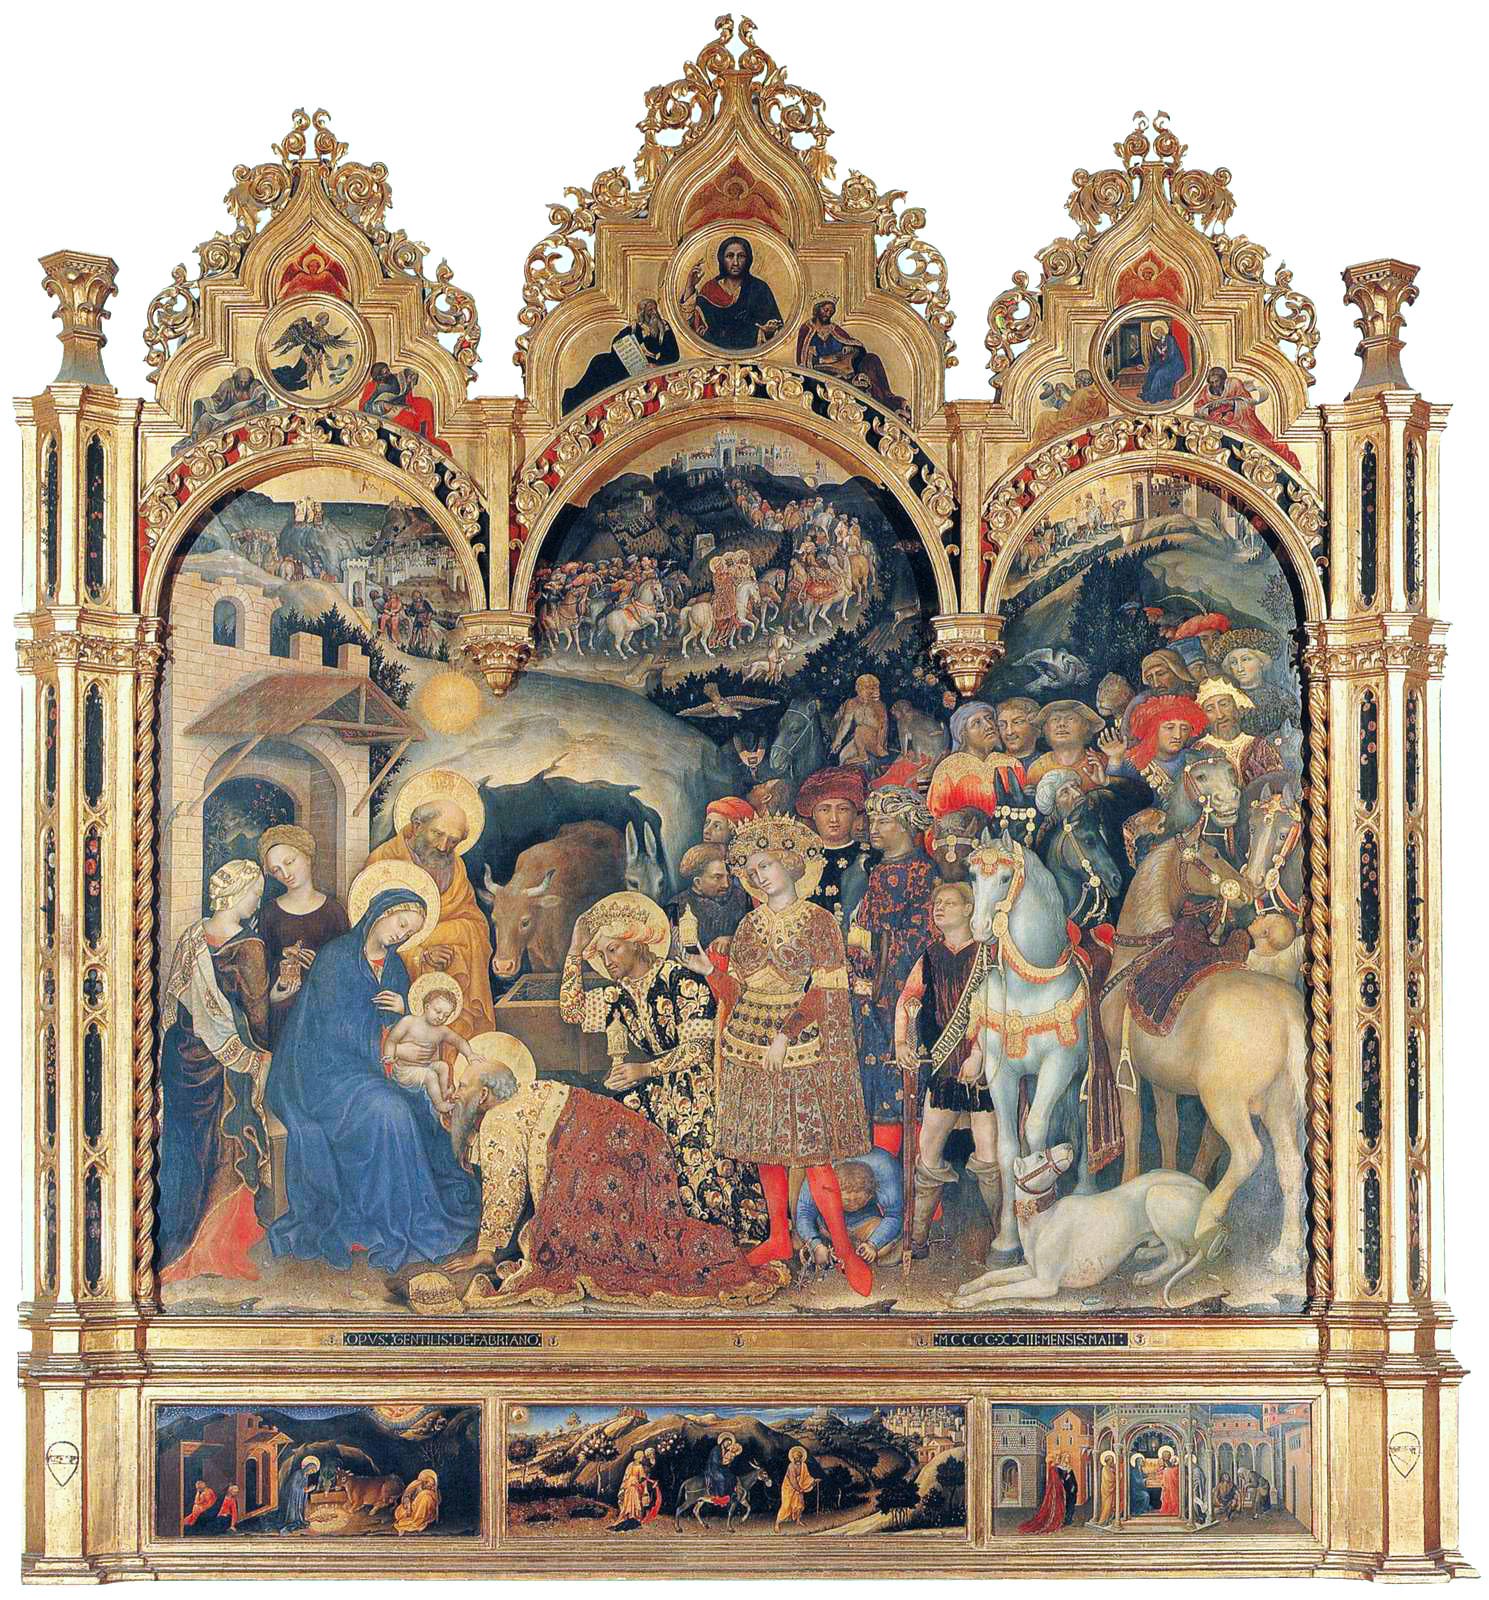 L'Adorazione dei Magi di Gentile da Fabriano (Uffizi, Firenze)